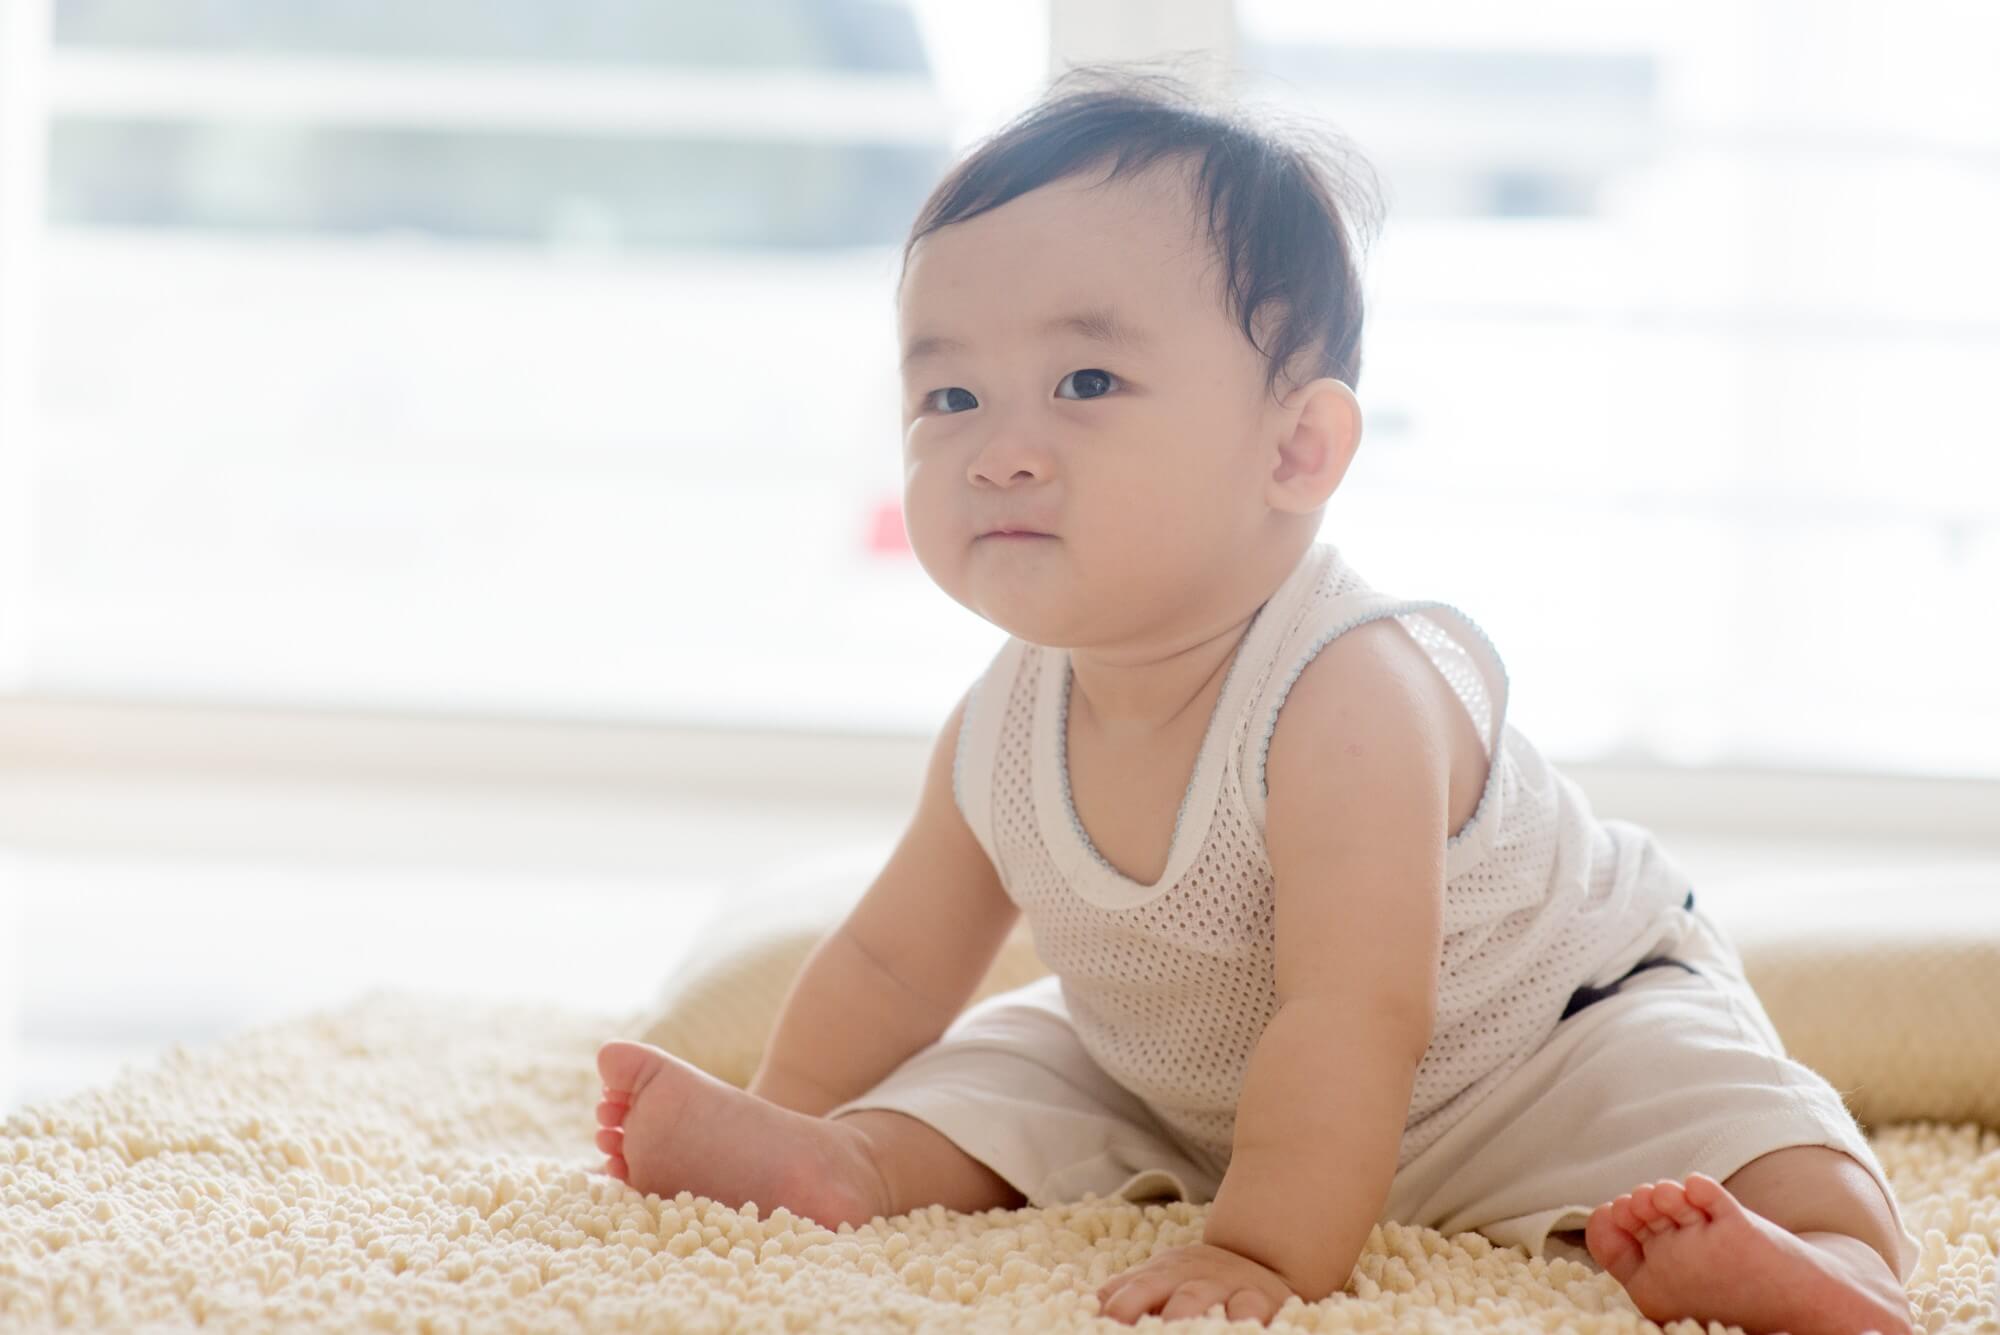 bayi-usia-9-bulan-daya-jelajah-si-kecil-header-image.jpg